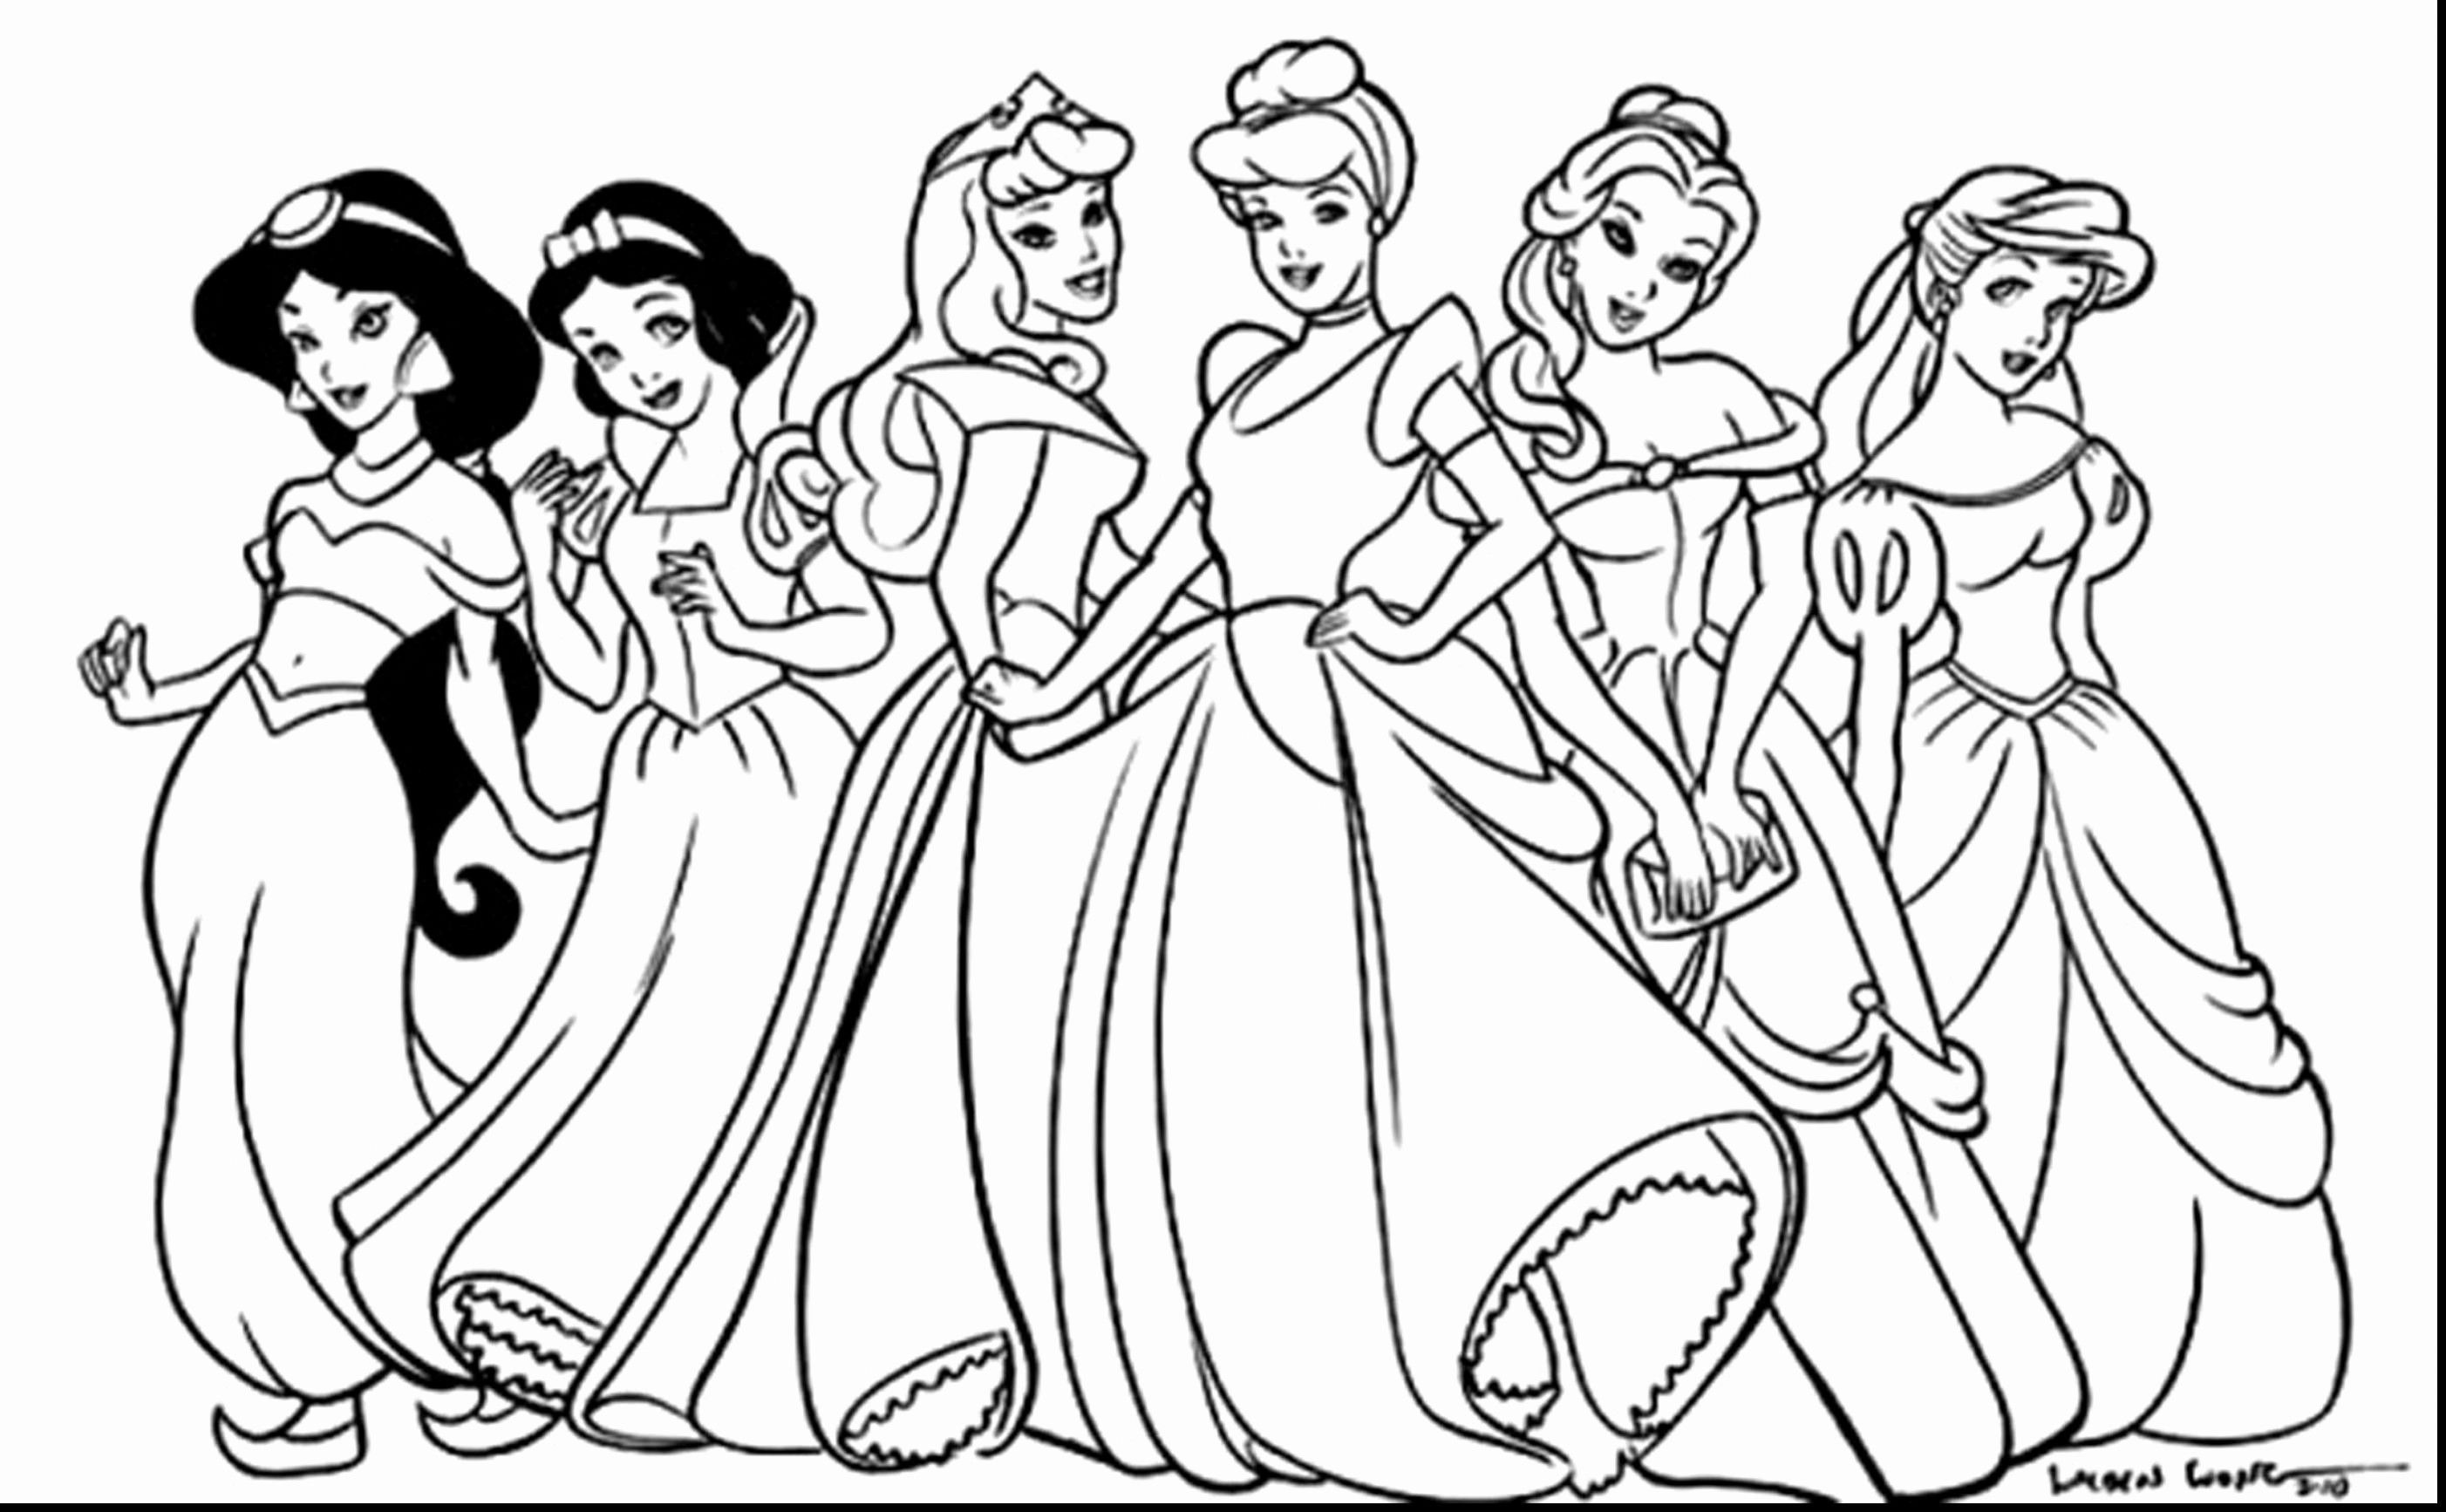 Coloring Pages Princess Pdf Disney princess coloring